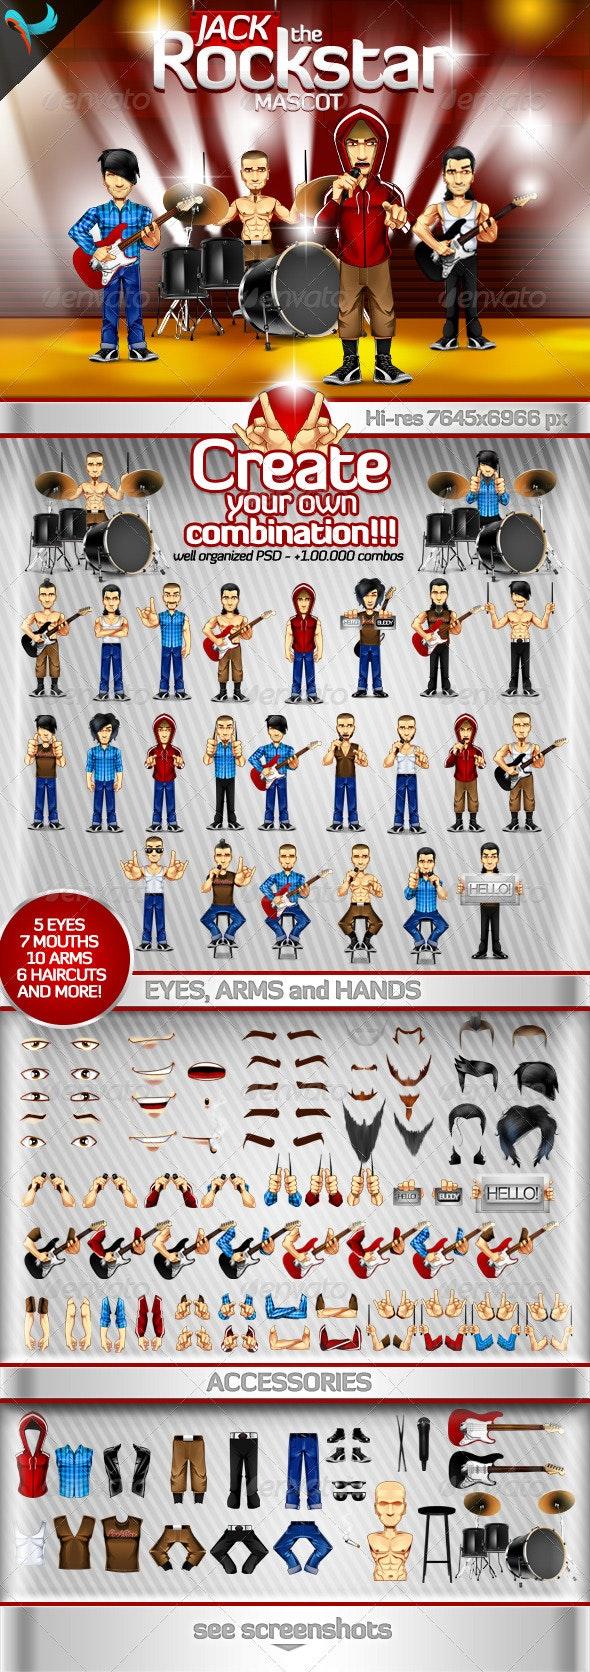 Editable Rockstar - Rockband Mascot - Characters Illustrations